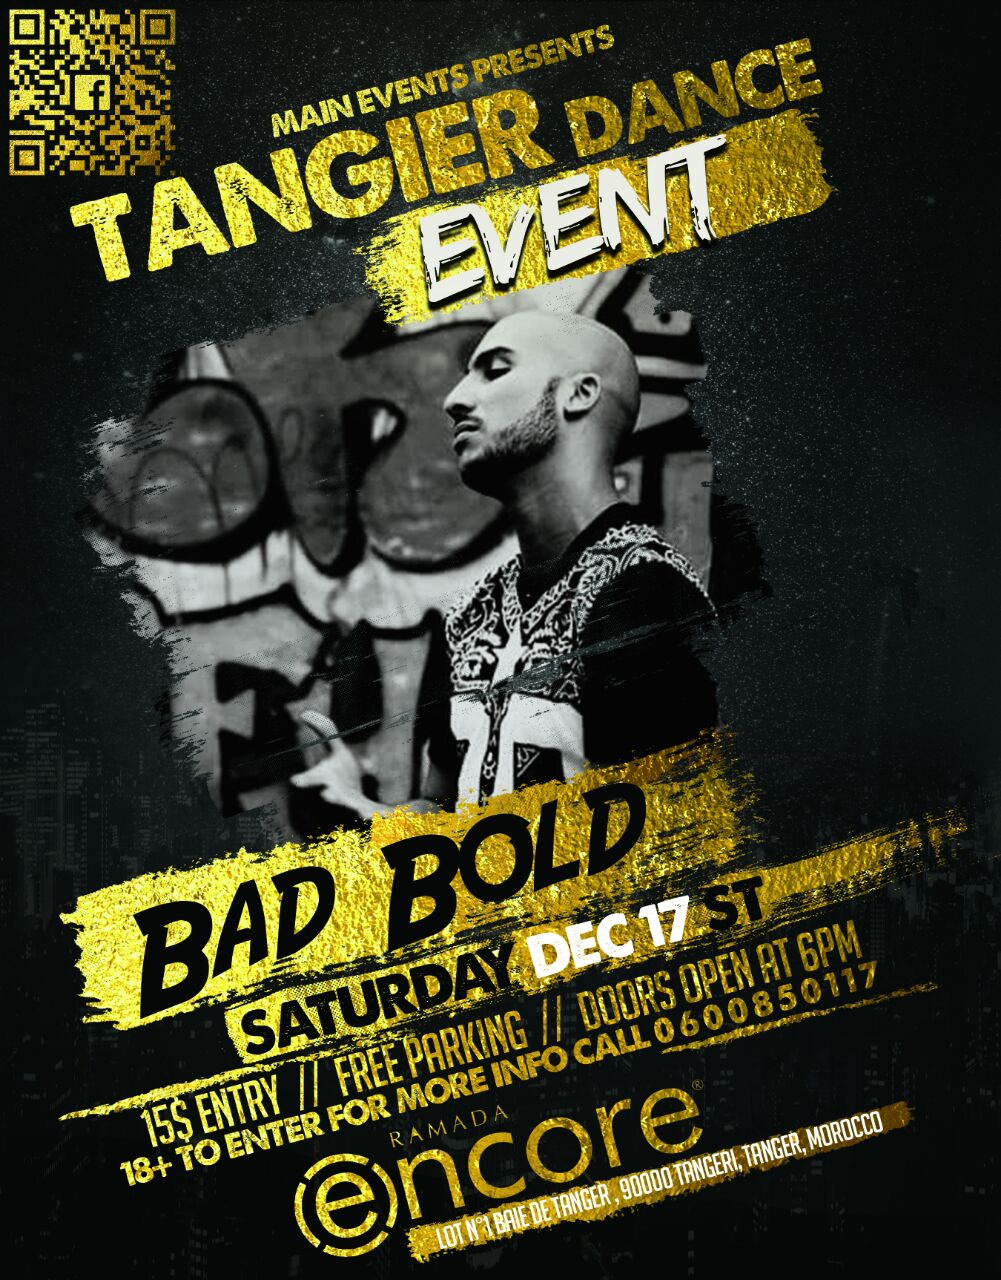 Tangier dance event - Tanger